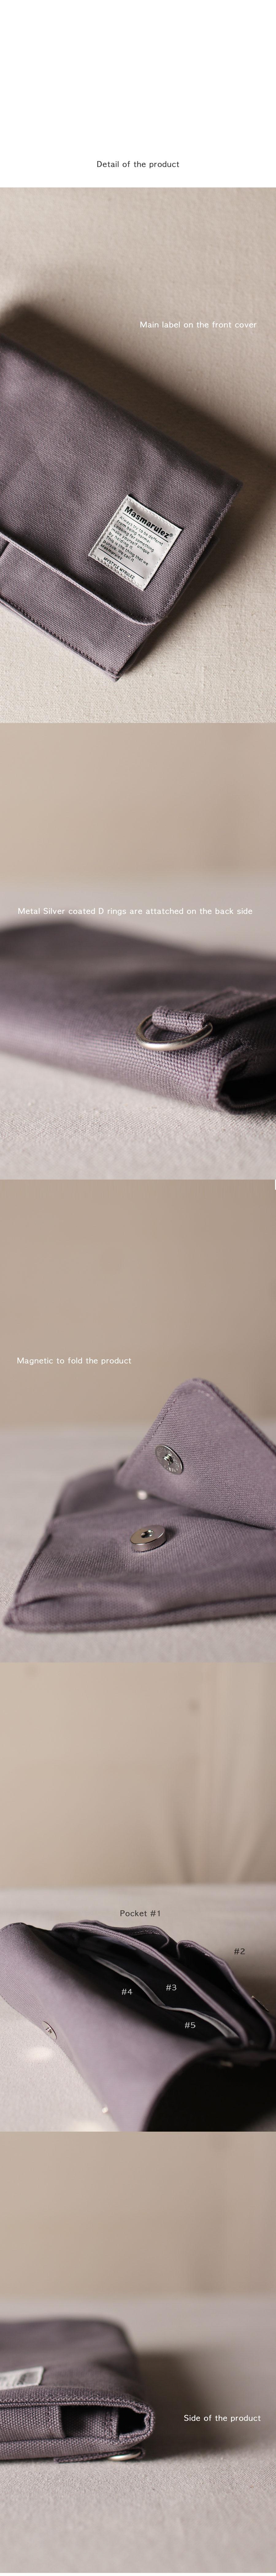 s-mini-pocket-gray-4.jpg